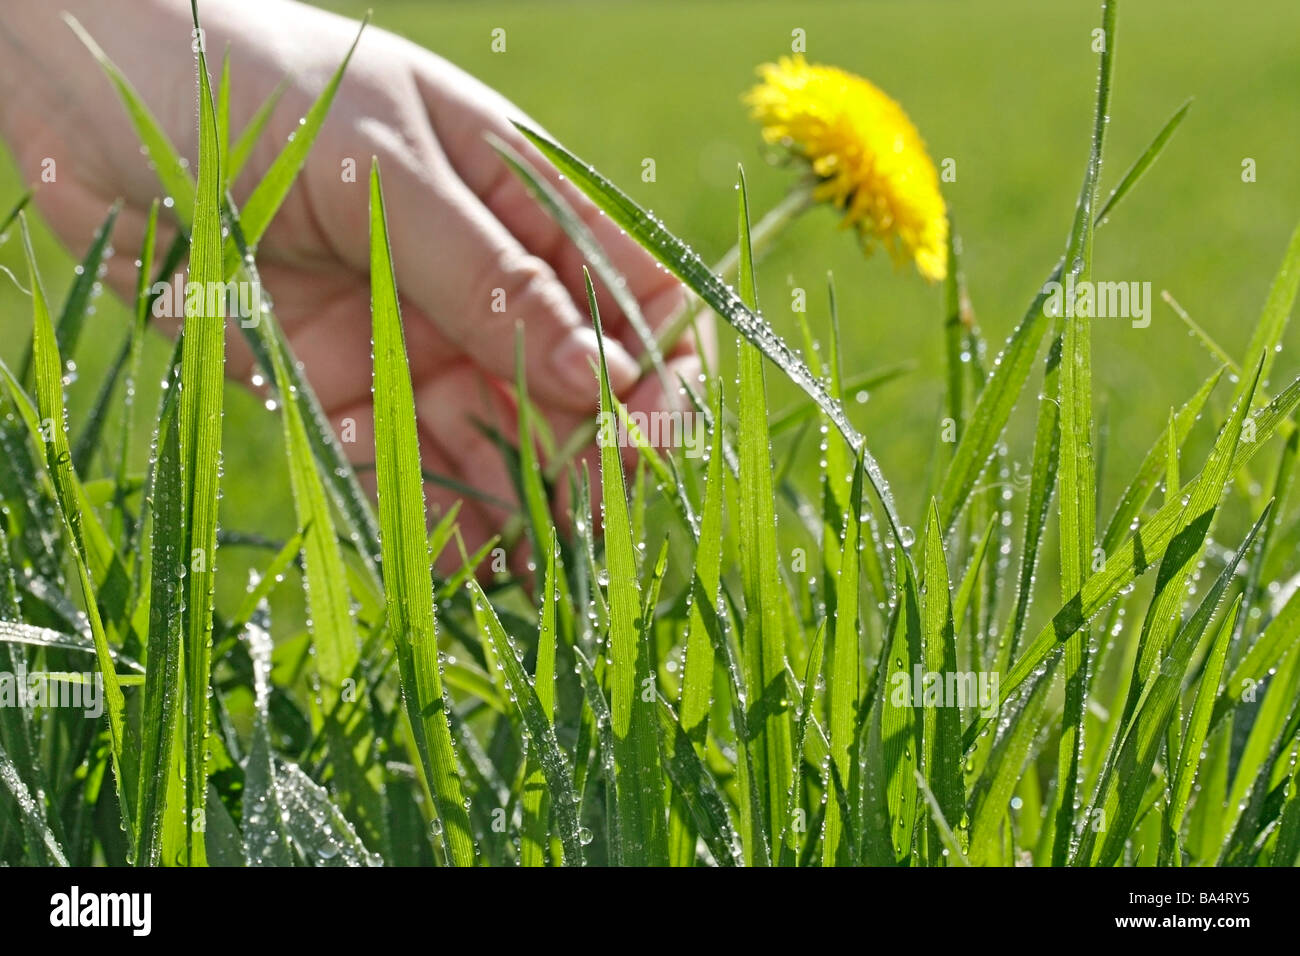 Grass and dew. Dandelion (Taraxacum officinale) - Stock Image